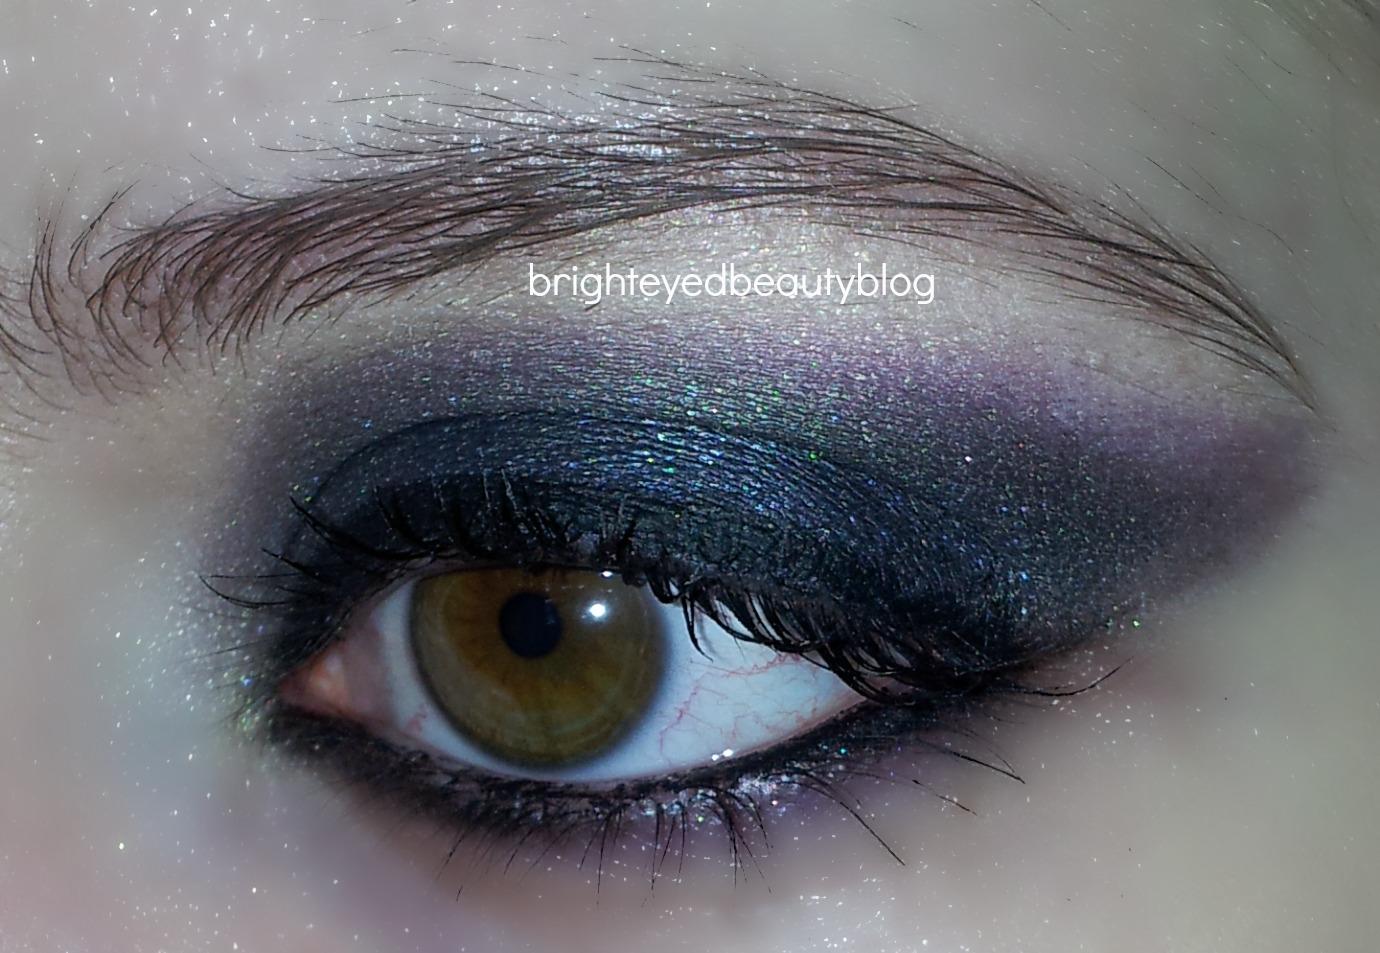 http://4.bp.blogspot.com/-1YbI6Qdu-50/ULGEA8S4TaI/AAAAAAAABVw/MBYE3XQ7Tnc/s1600/close+up+open+eye+use+this.jpg.jpg